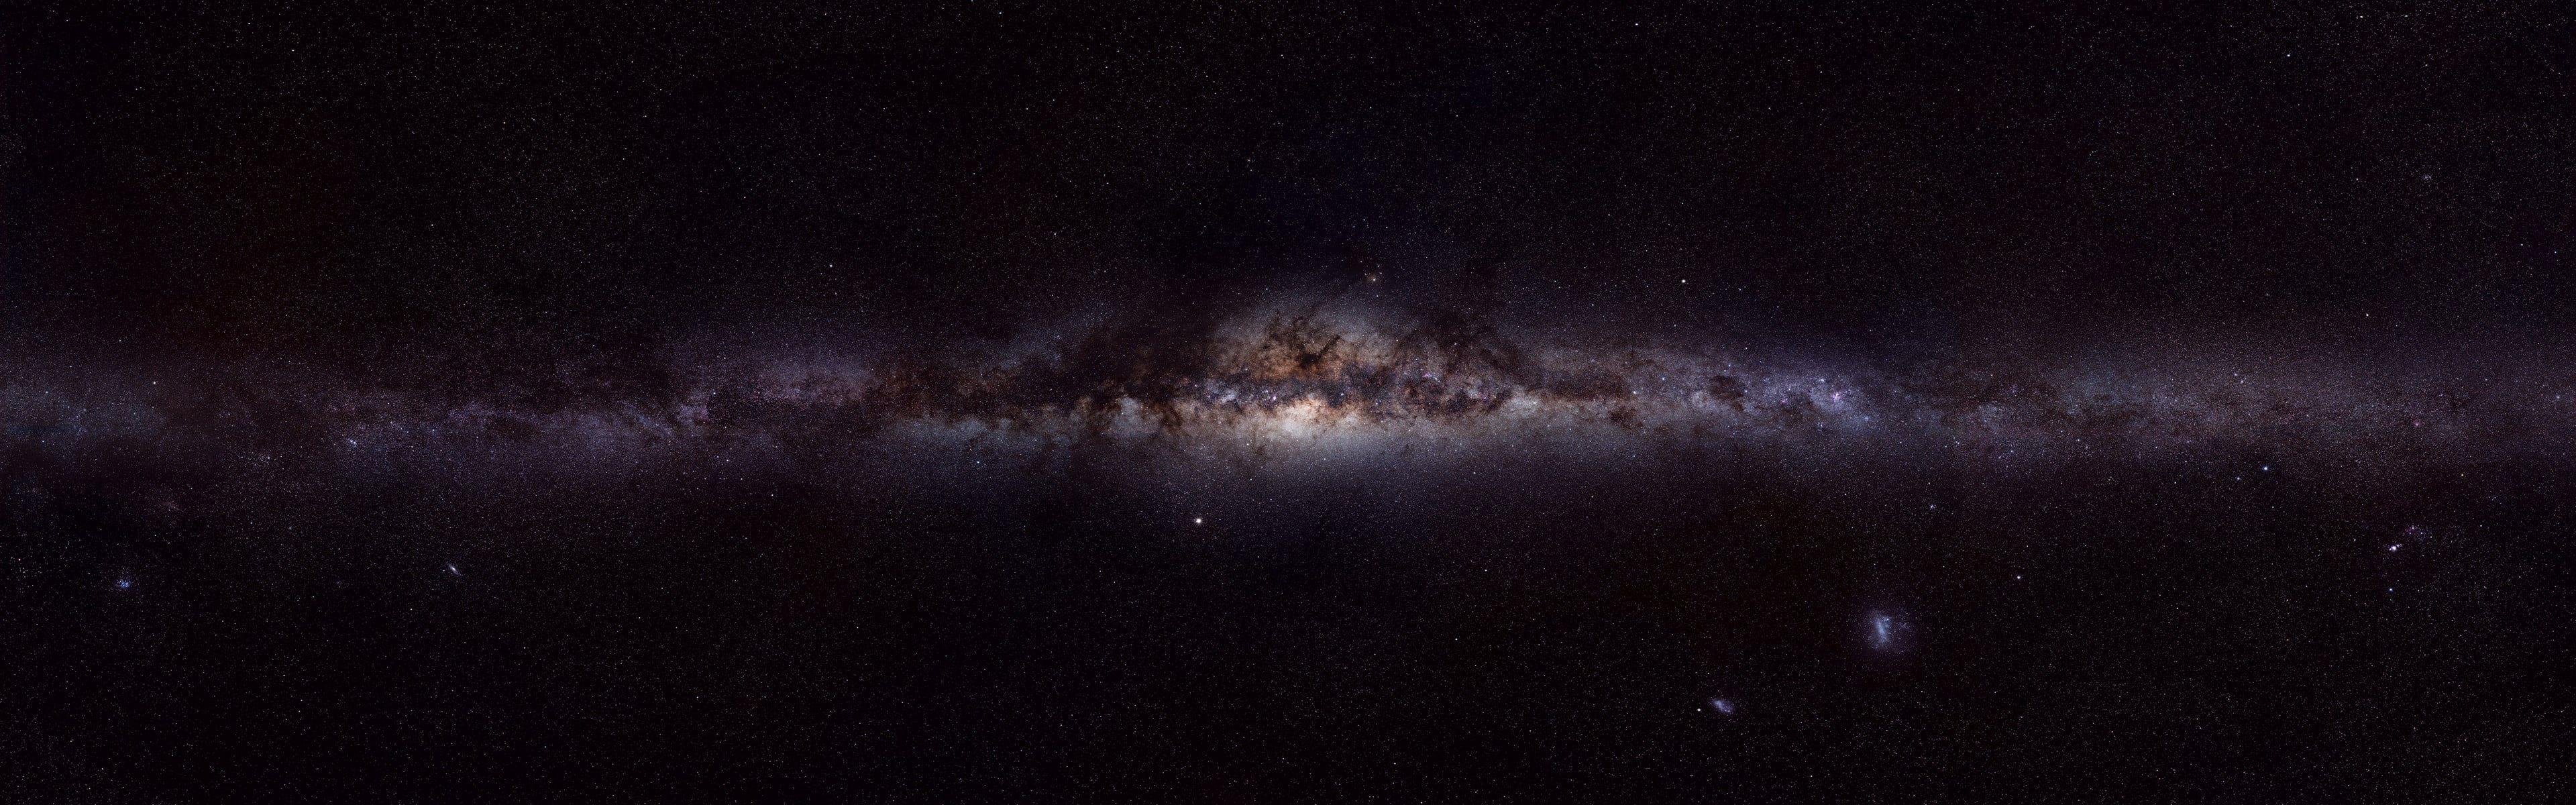 Milky Way space galaxy stars multiple display dual